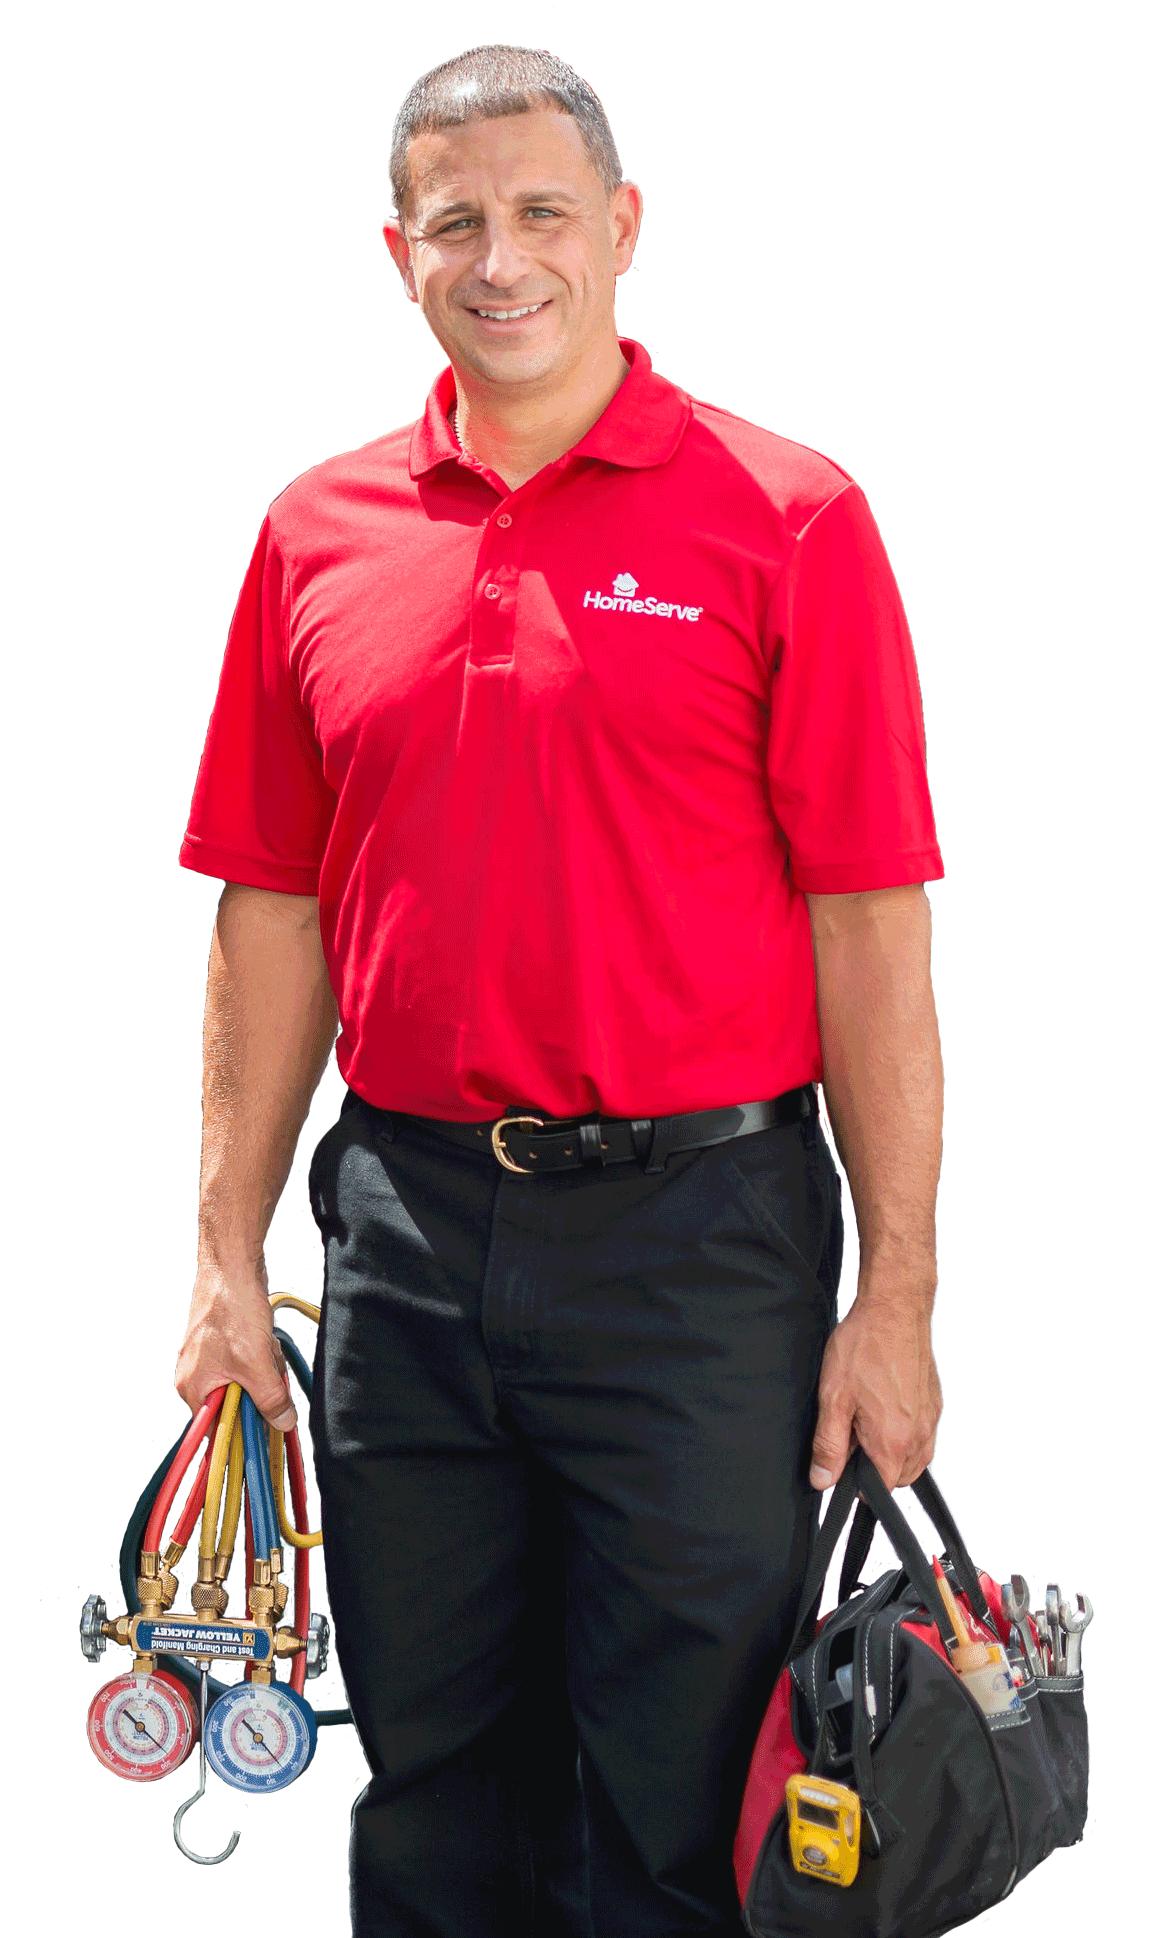 Patrick Sassone, Master HVAC Technician